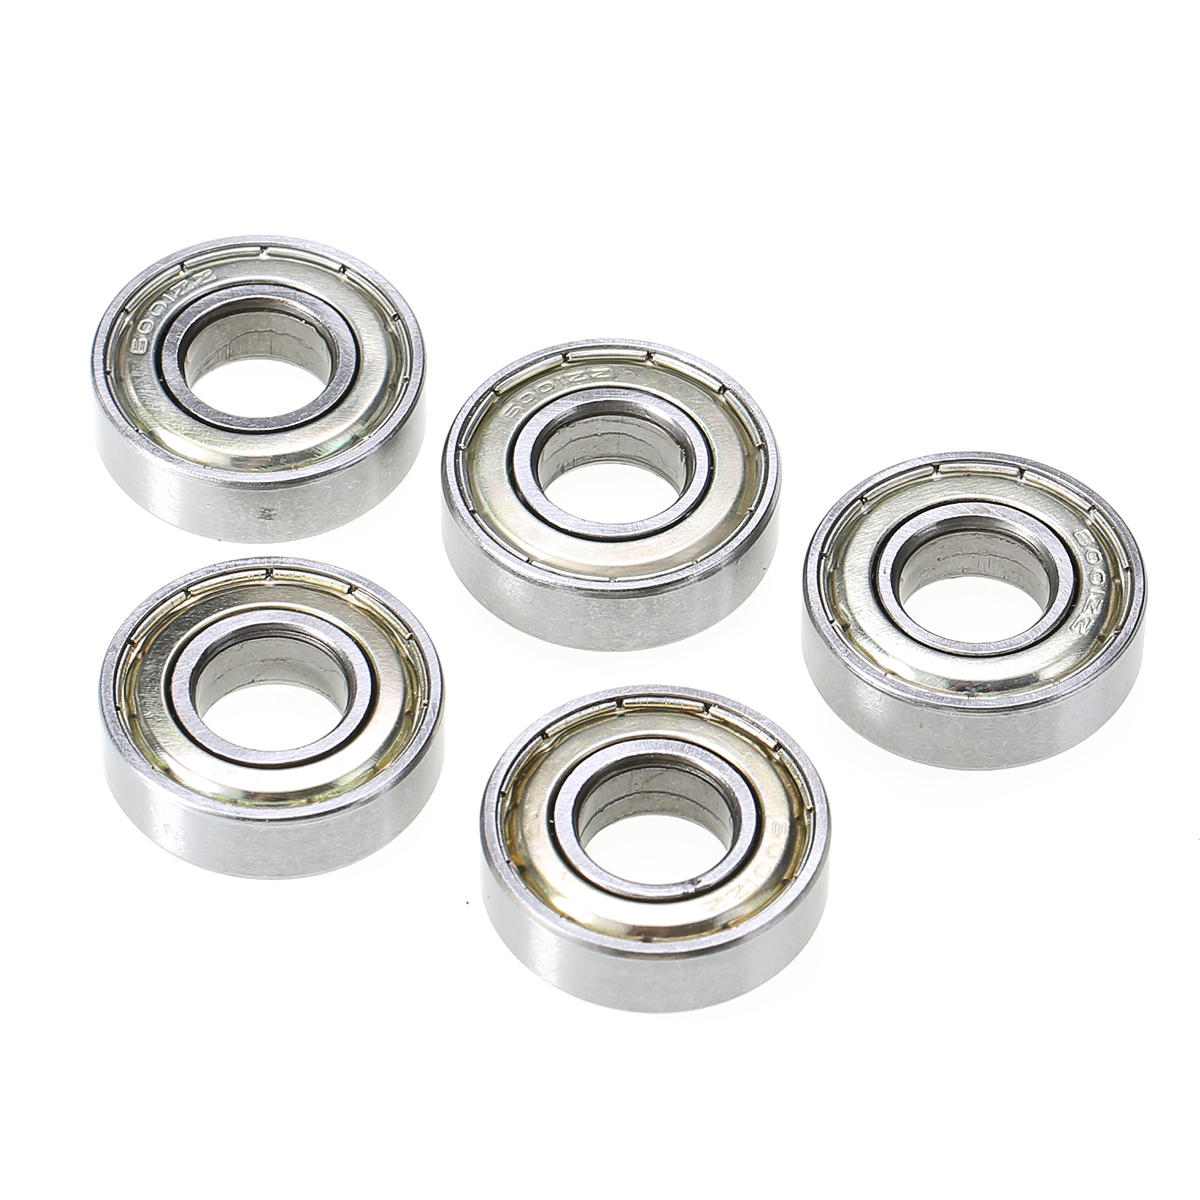 5PCS 6001ZZ Deep Groove Metal Double Shielded Ball Bearing Set 12mm*28mm*8mm